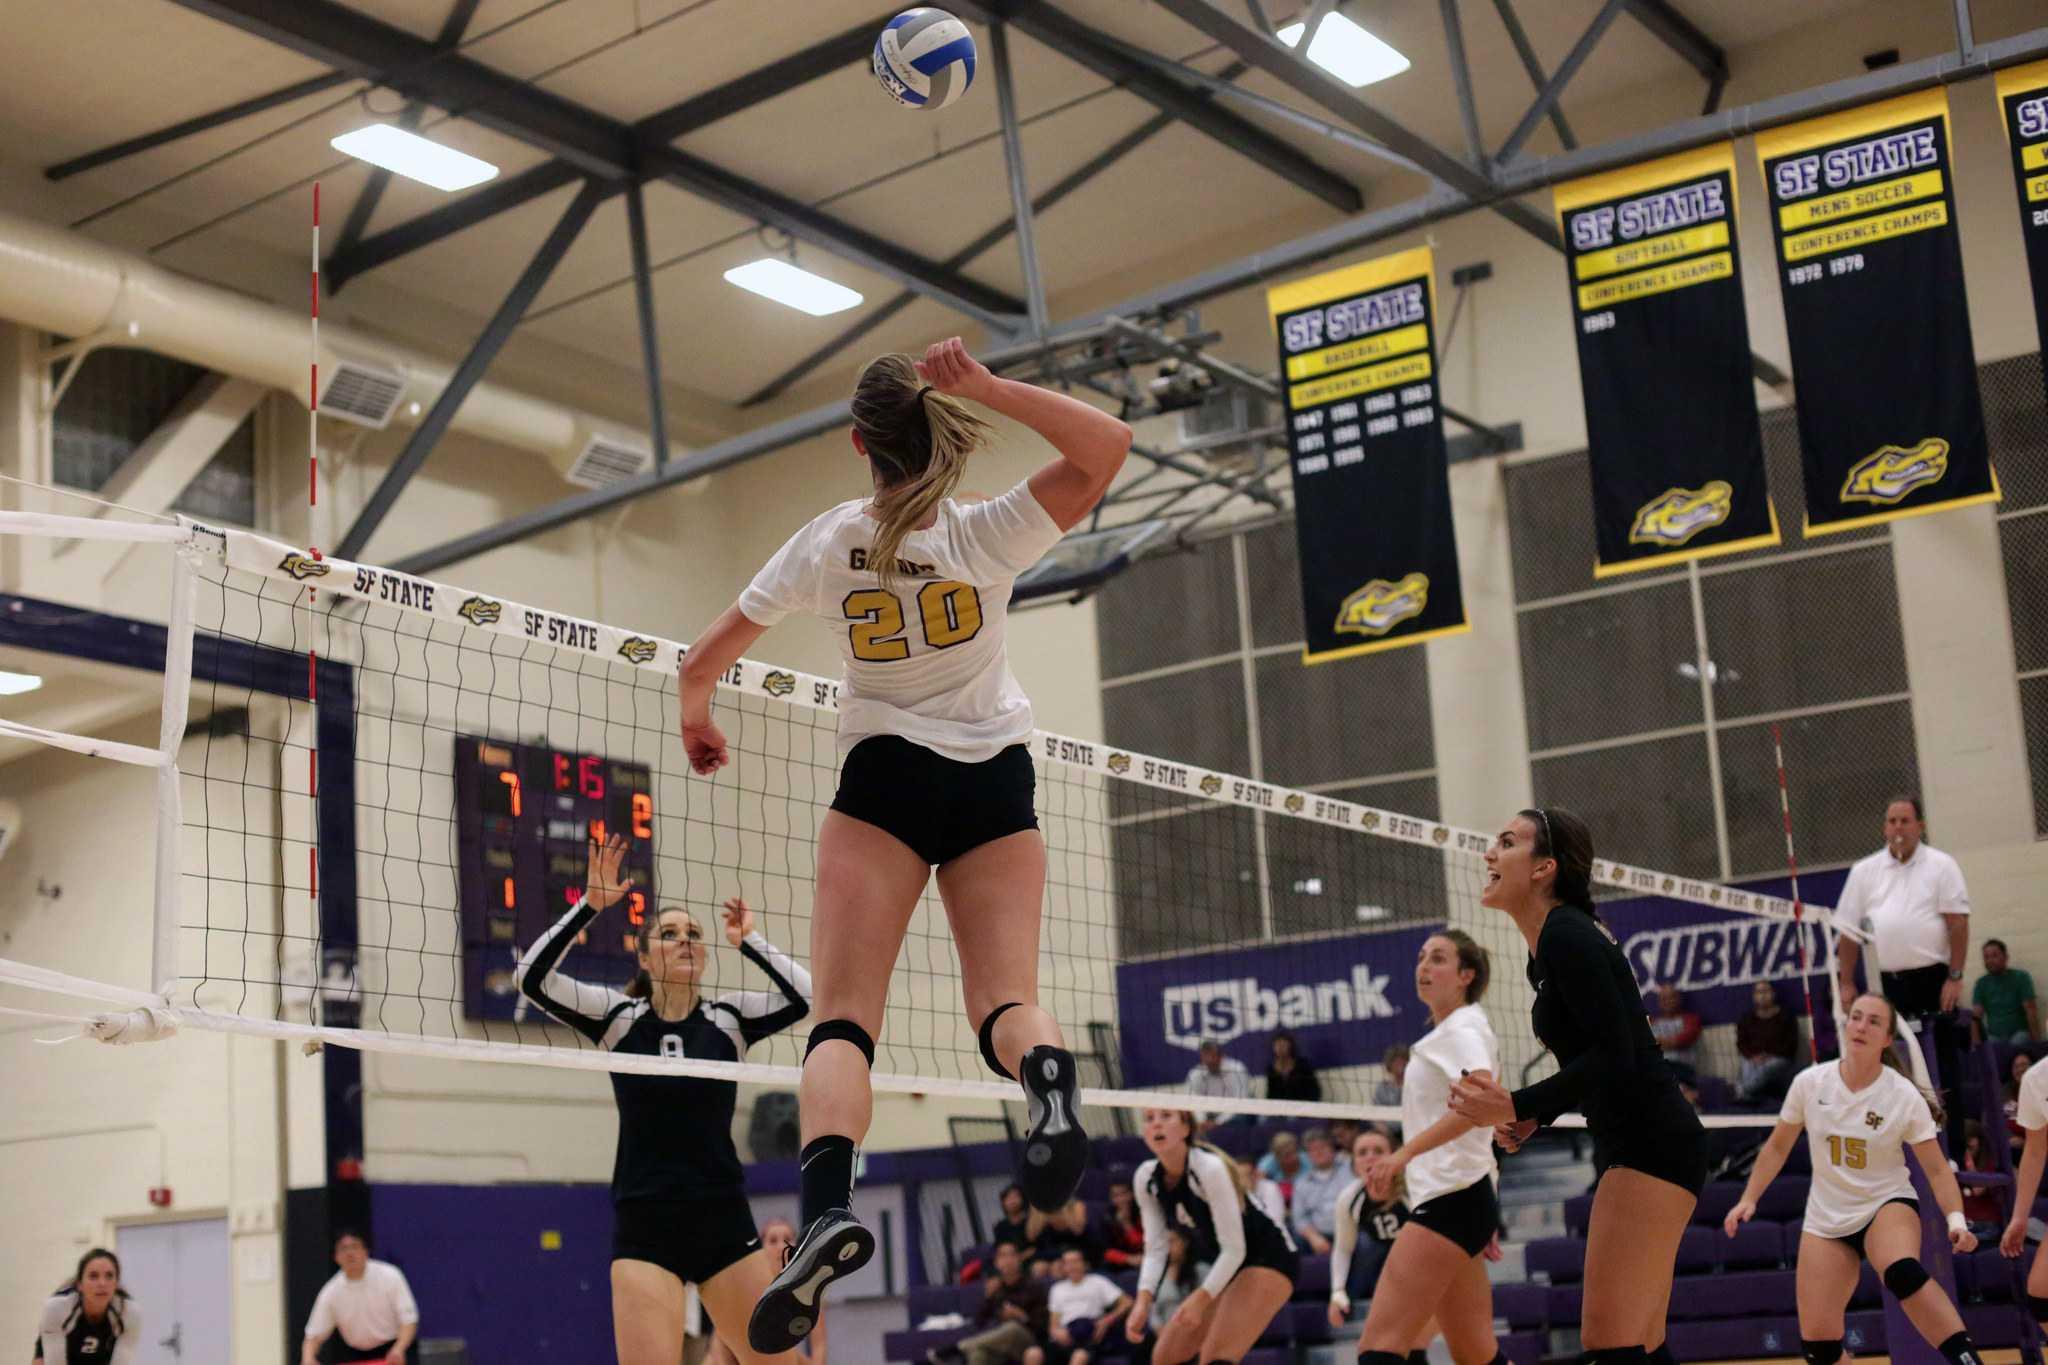 Gators volleyball falls just short in dramatic five set match